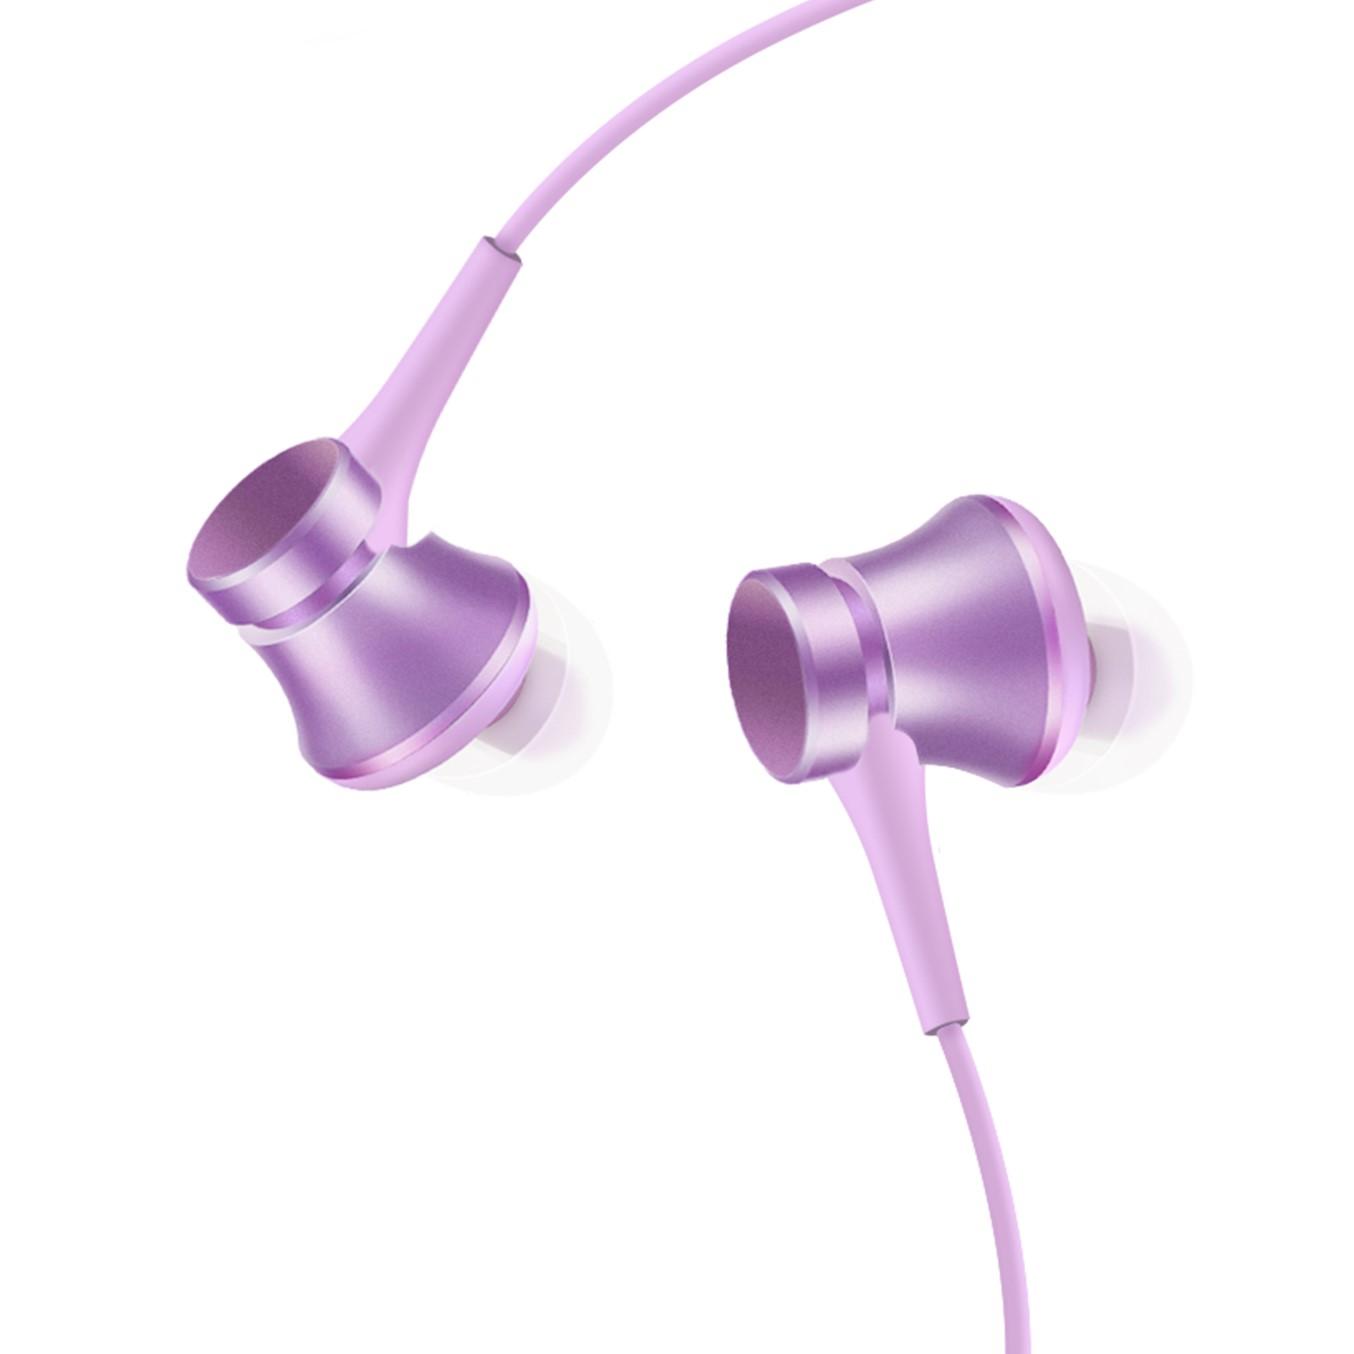 Auricular-xiaomi-mi-in-ear-headphones-basic-jack-3-5mm-purpura